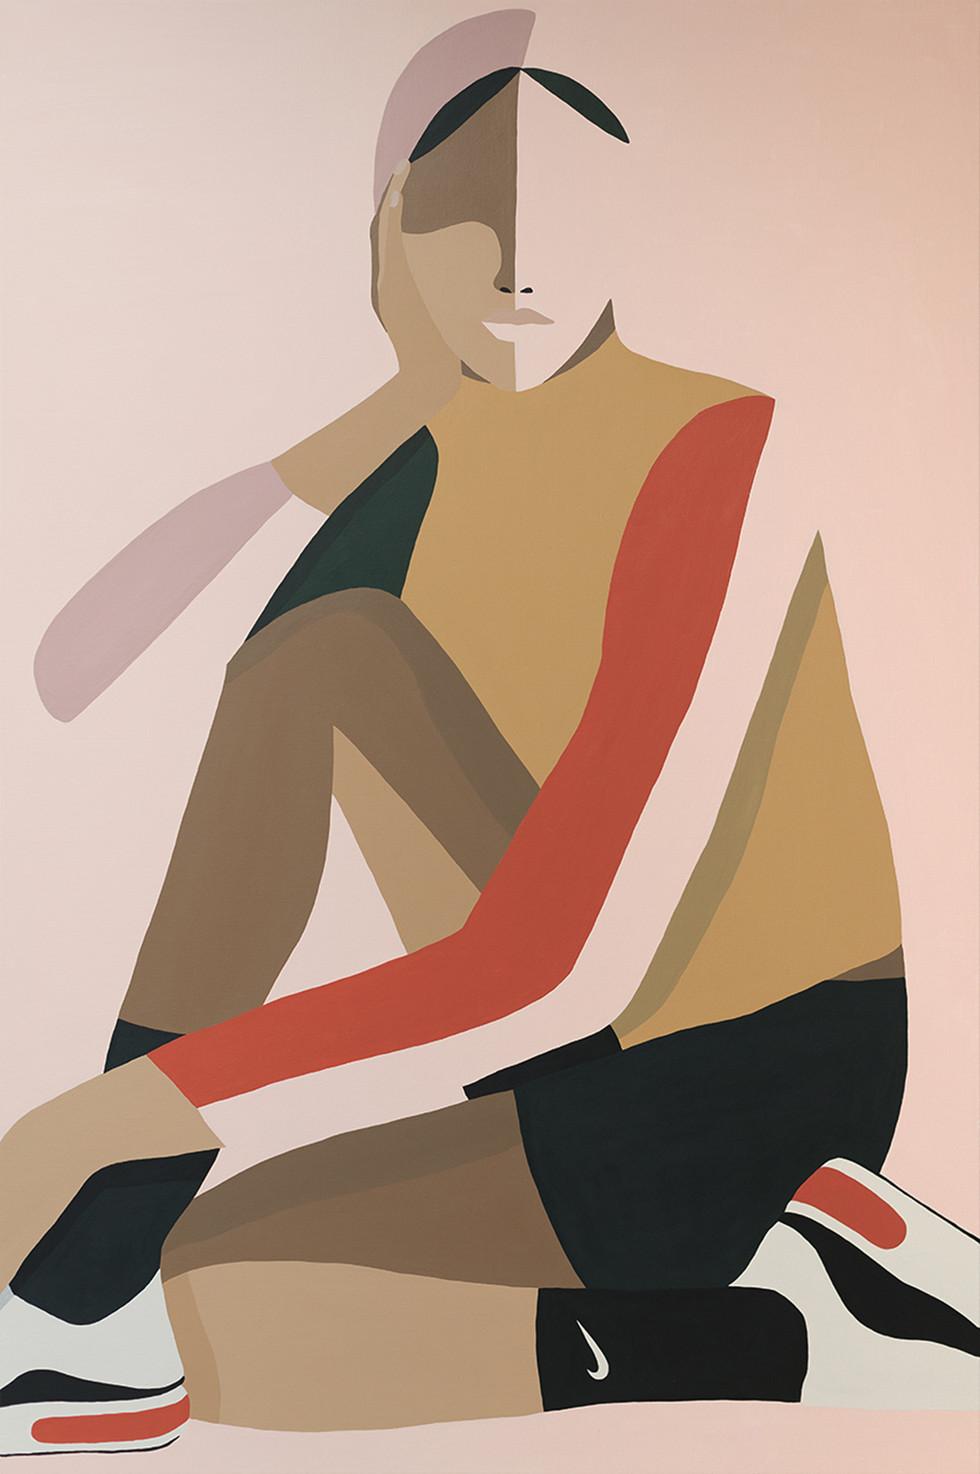 Gold Standard, 2020 acrylic on canvas 80 x 120 cm